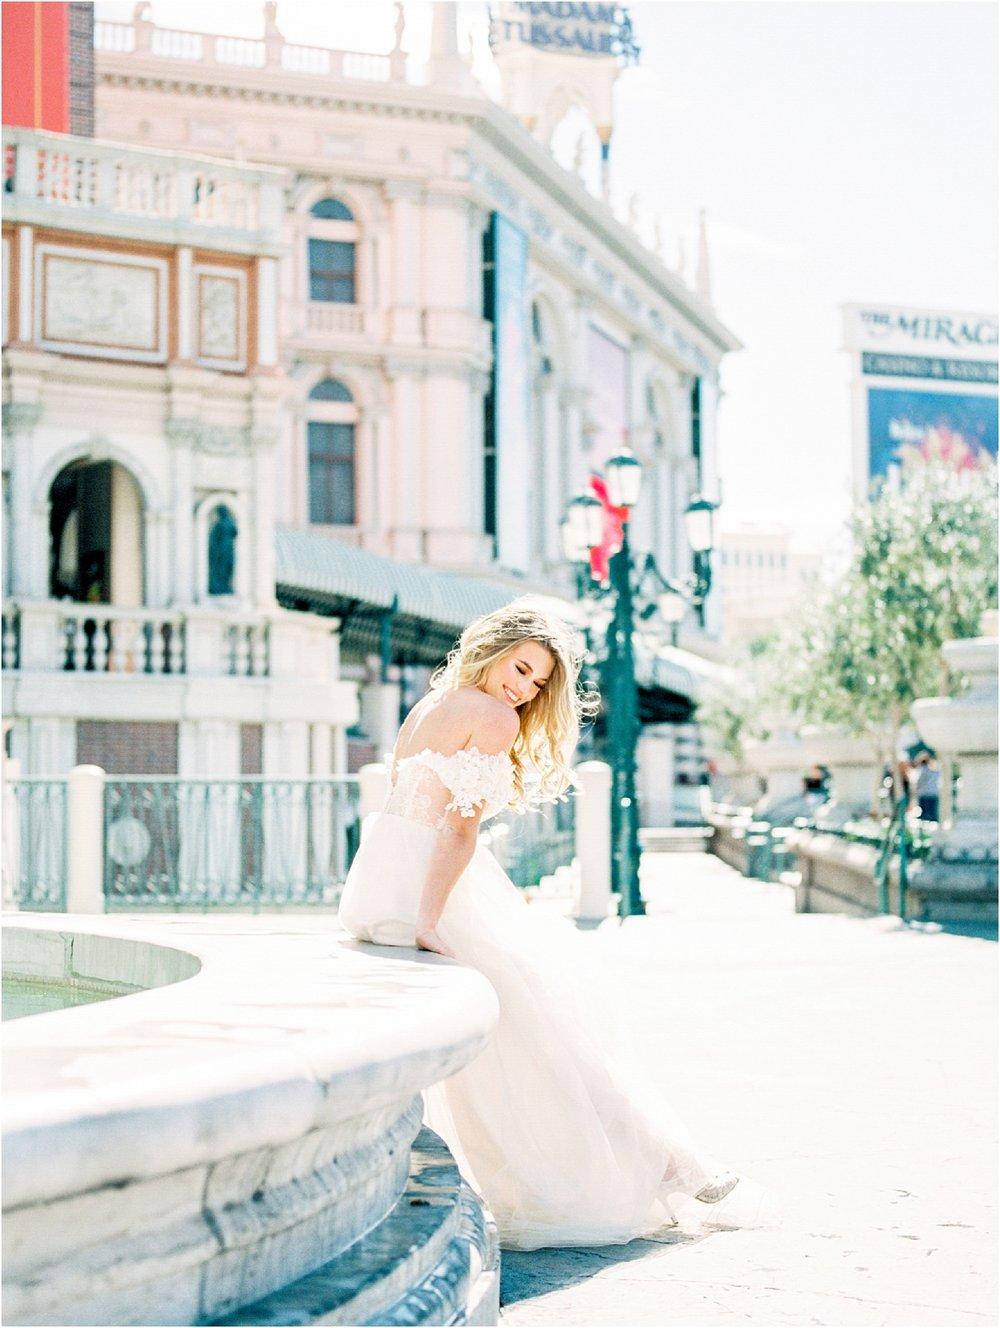 Lisa Silva Photography- Ponte Vedra Beach, St. Augustine and Jacksonville, Florida Fine Art Film Wedding and Boudoir Photography- Fine Art Film Bridal Editorial at the Venitian, Las Vegas 0.jpg